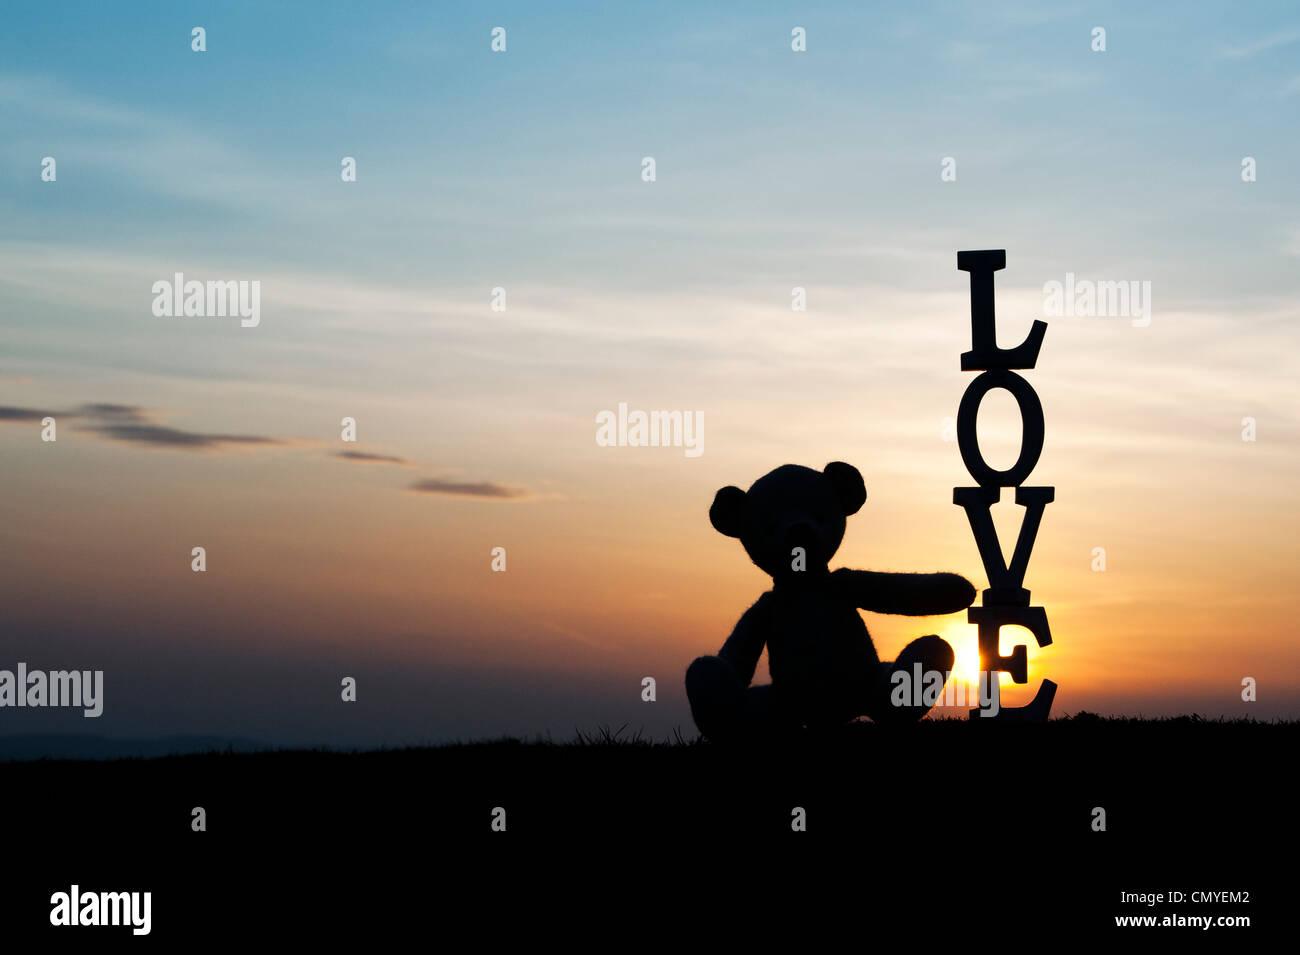 Teddy Bär sitzend als nächstes auch das Wort Liebe bei Sonnenuntergang. Silhouette Stockbild